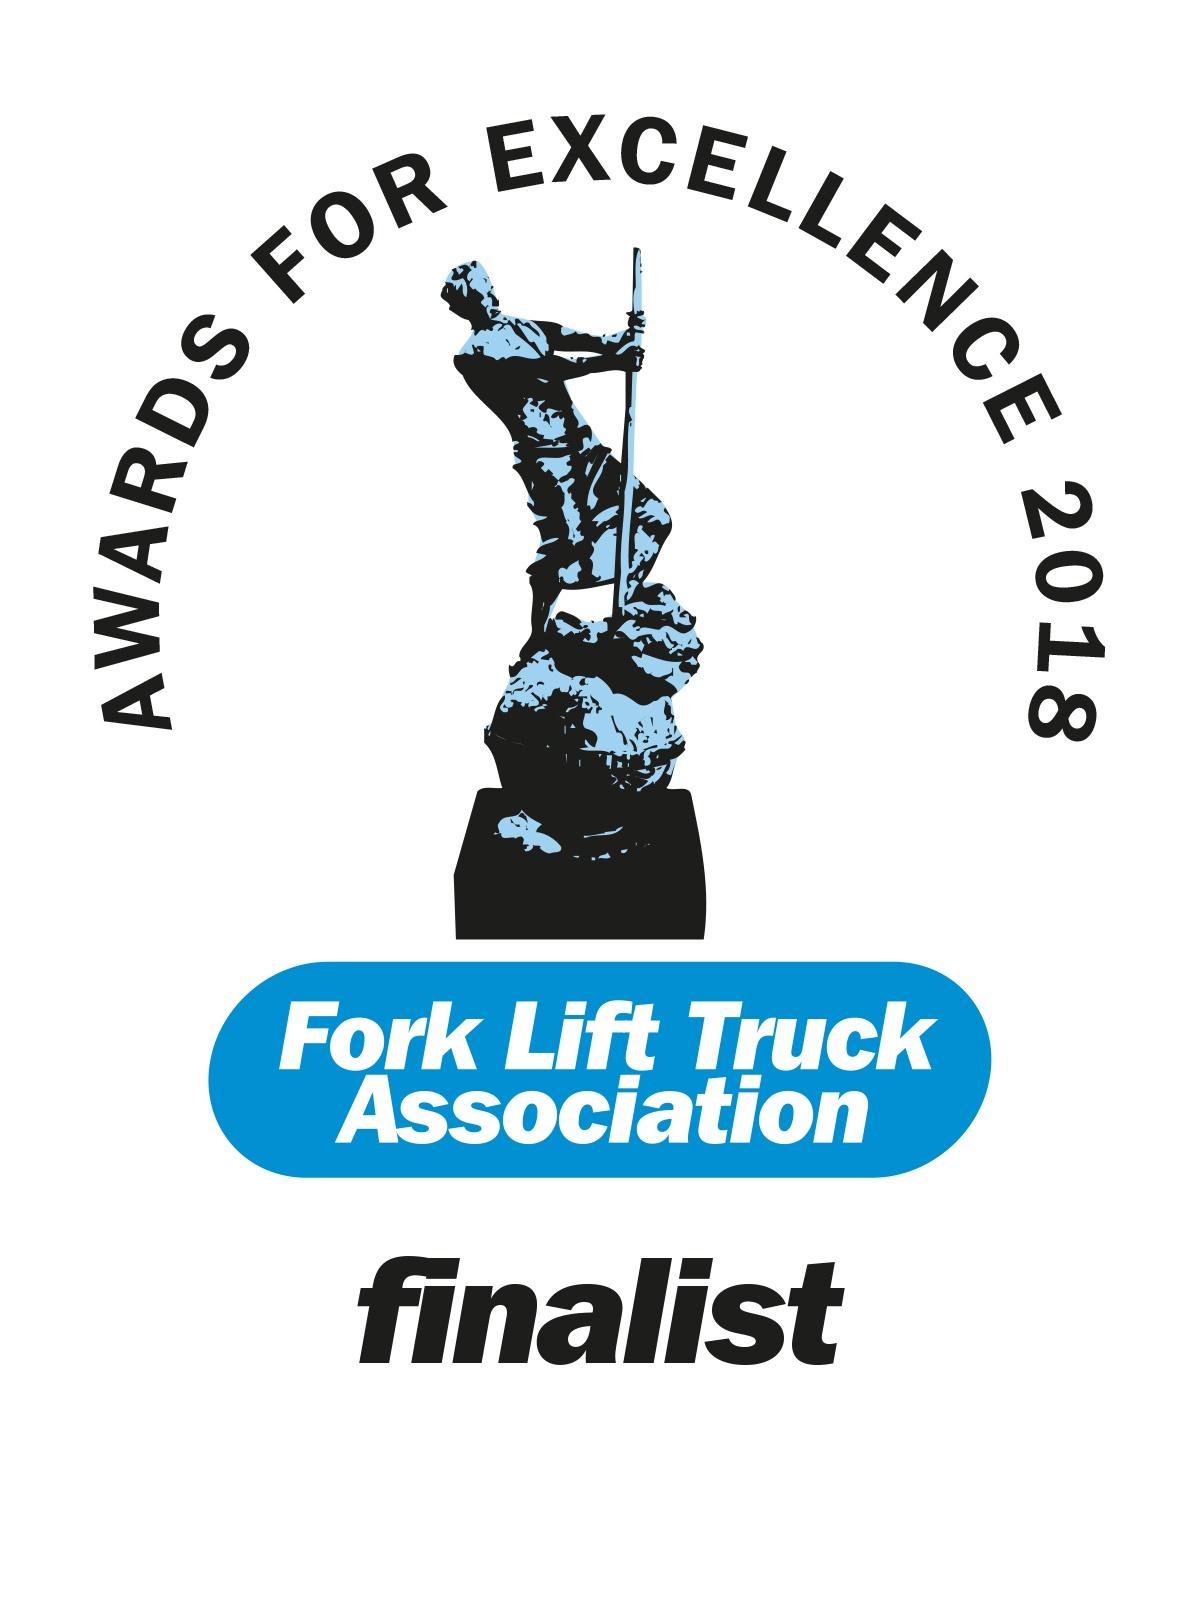 TCM Nominated for the 2018 Ergonomics and Safety FLTA Awards